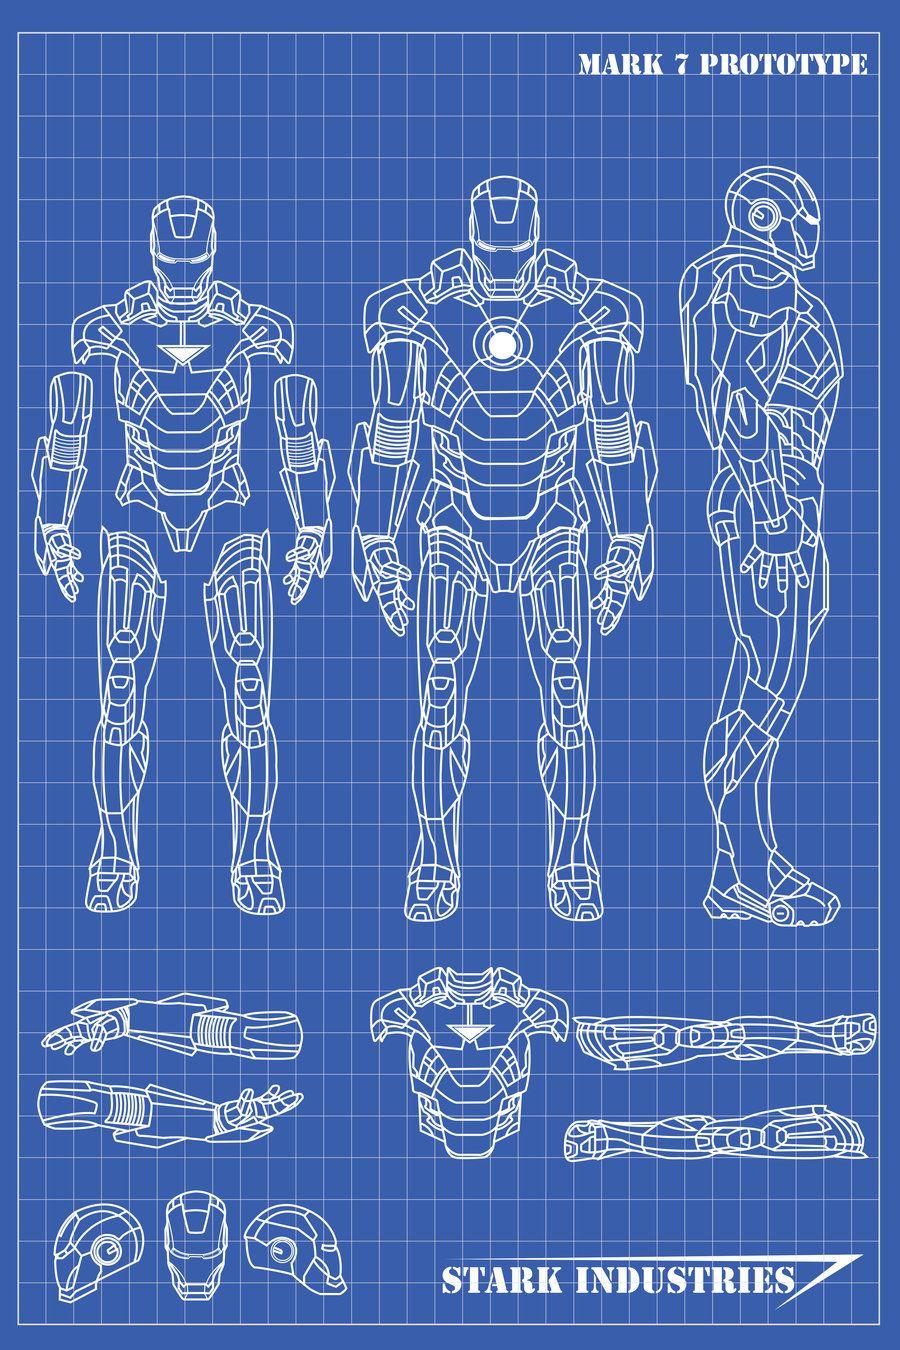 Iron Man Blueprints By Nickgonzales7 On DeviantART Movie Art Iron Man Iron Man Suit Iron